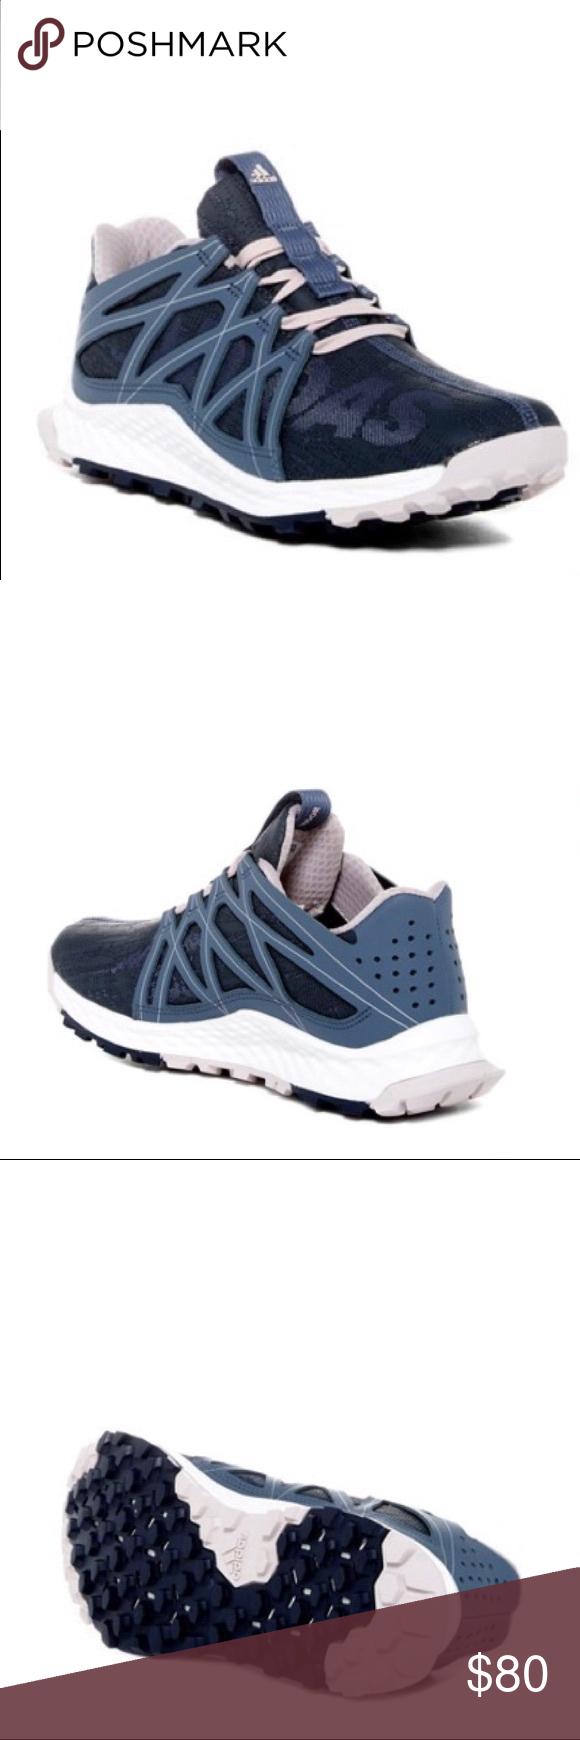 03eadb03712d42 adidas Women s Vigor Bounce Running Shoe adidas Women s Vigor Bounce  Running Shoe. Size 8. New in box. Details Sizing  True to size.